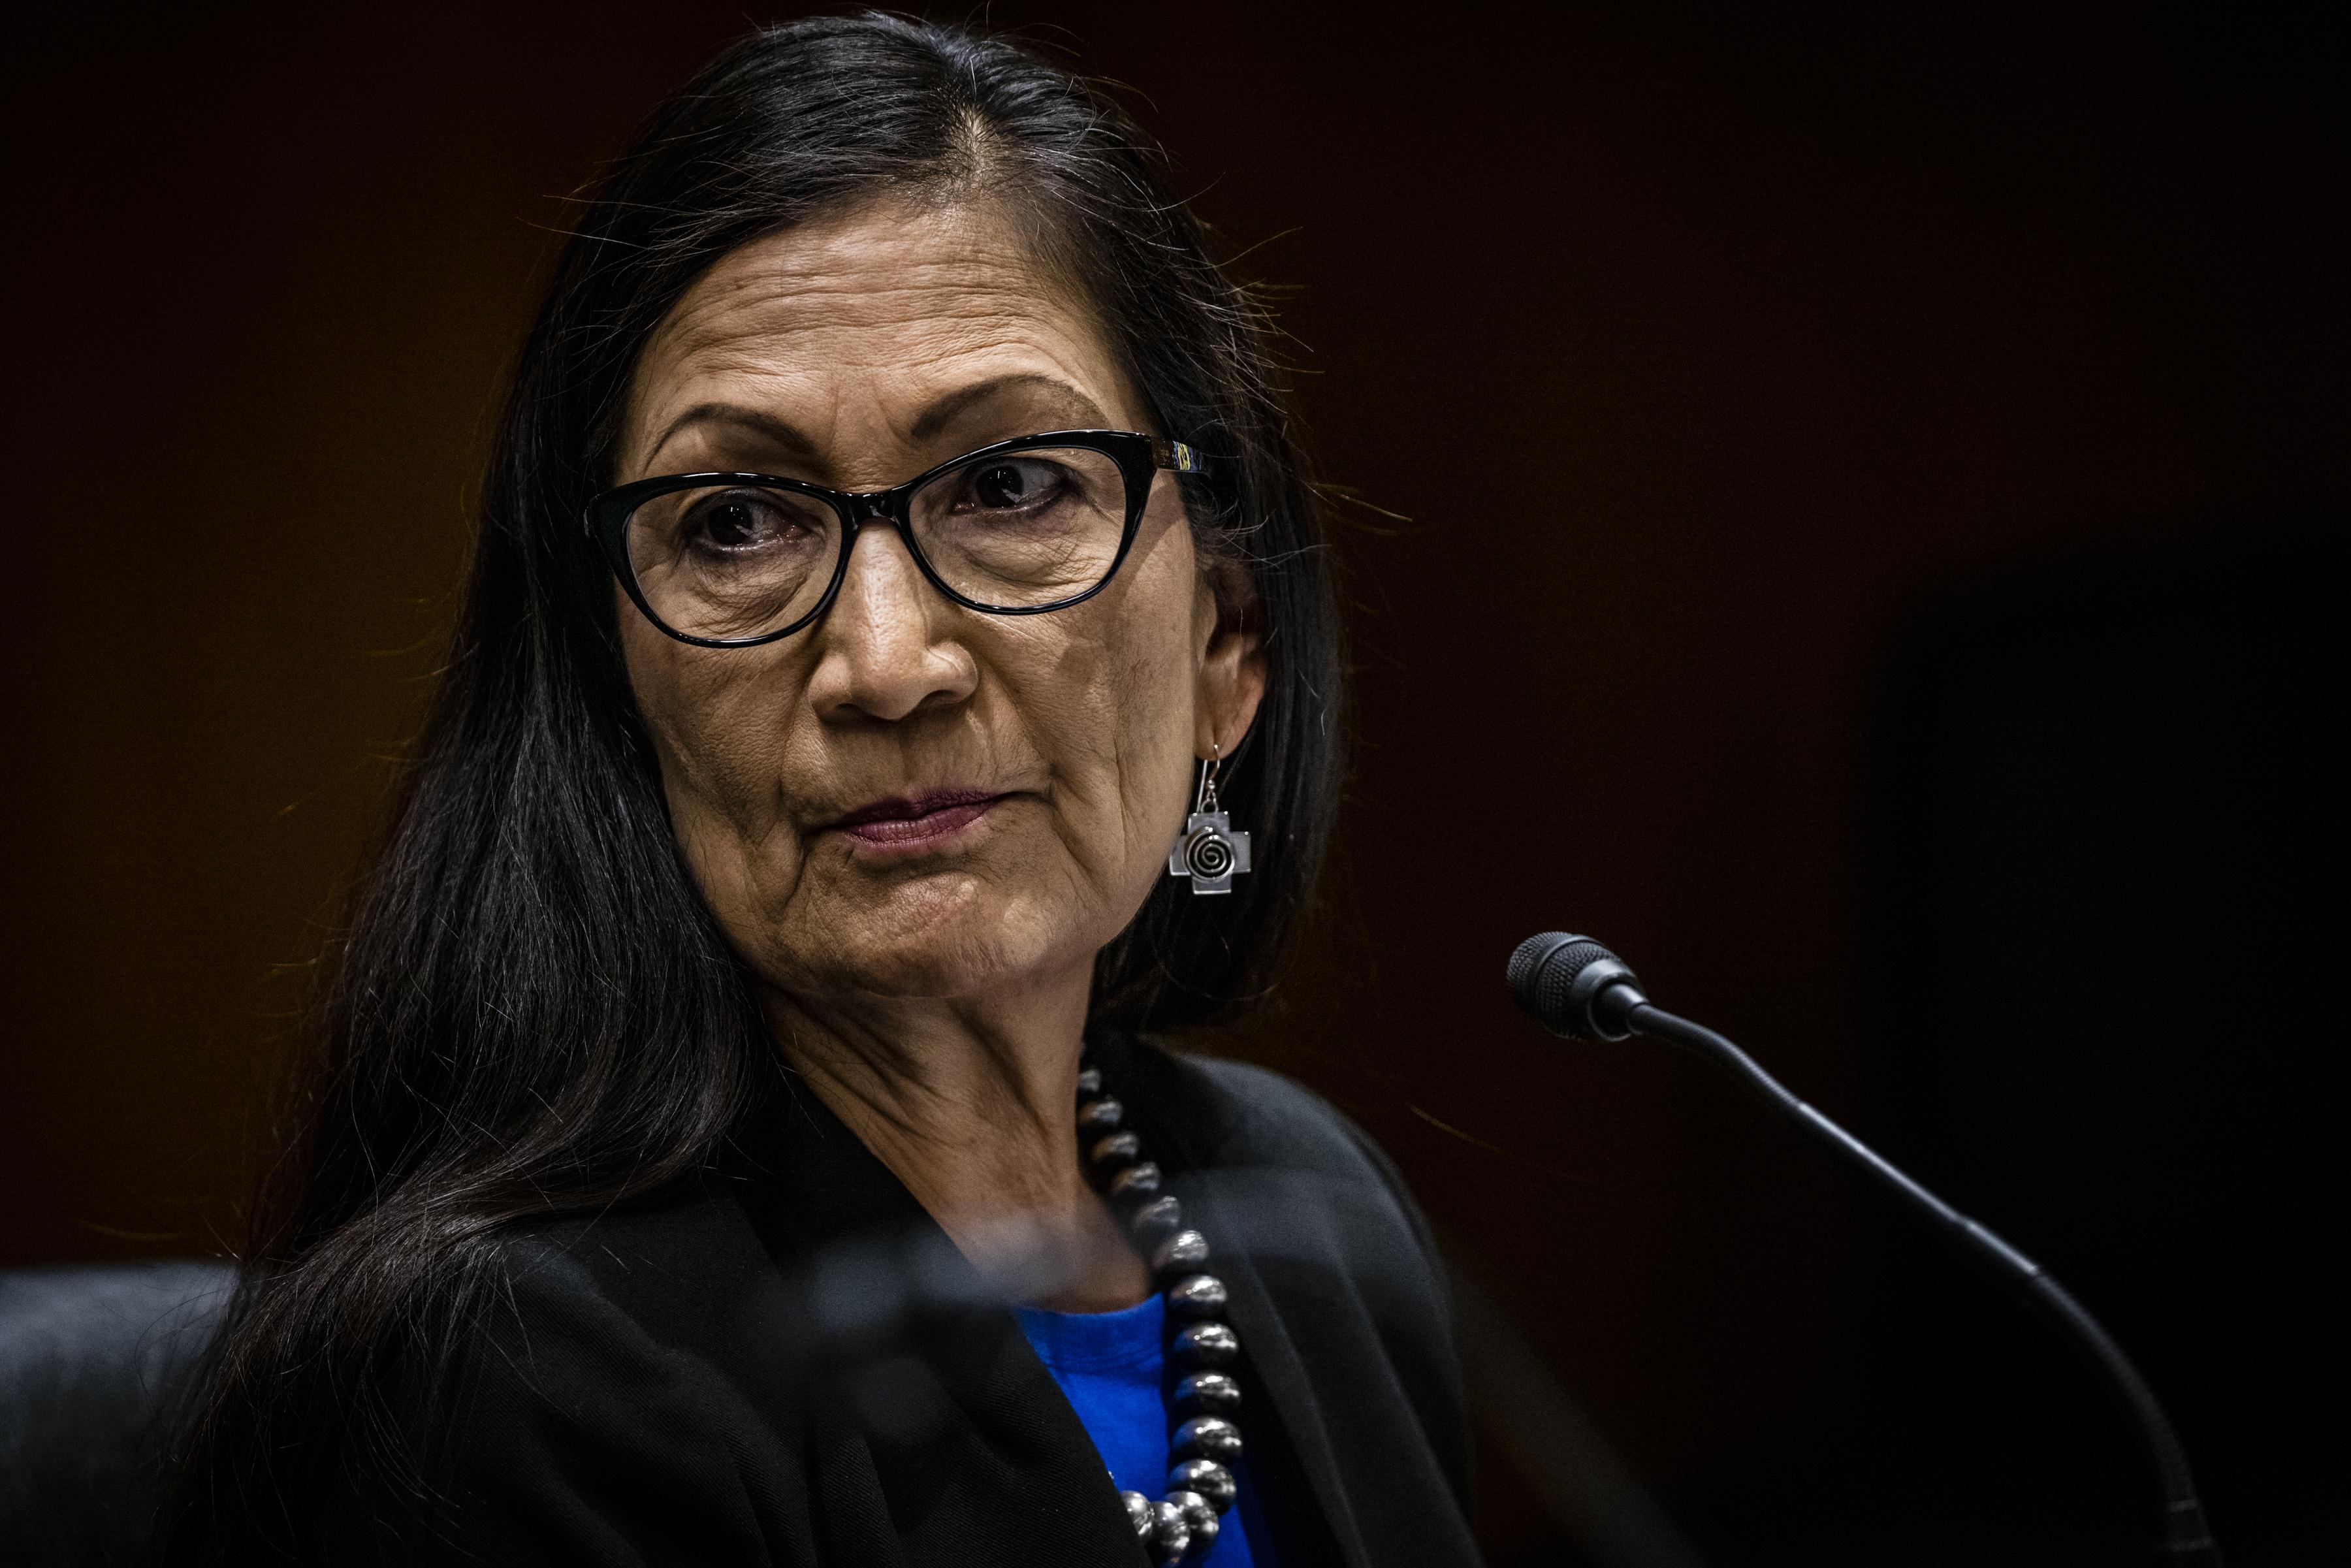 Interior Secretary Deb Haaland testifies during a hearing on June 16, 2021 in Washington, D.C.